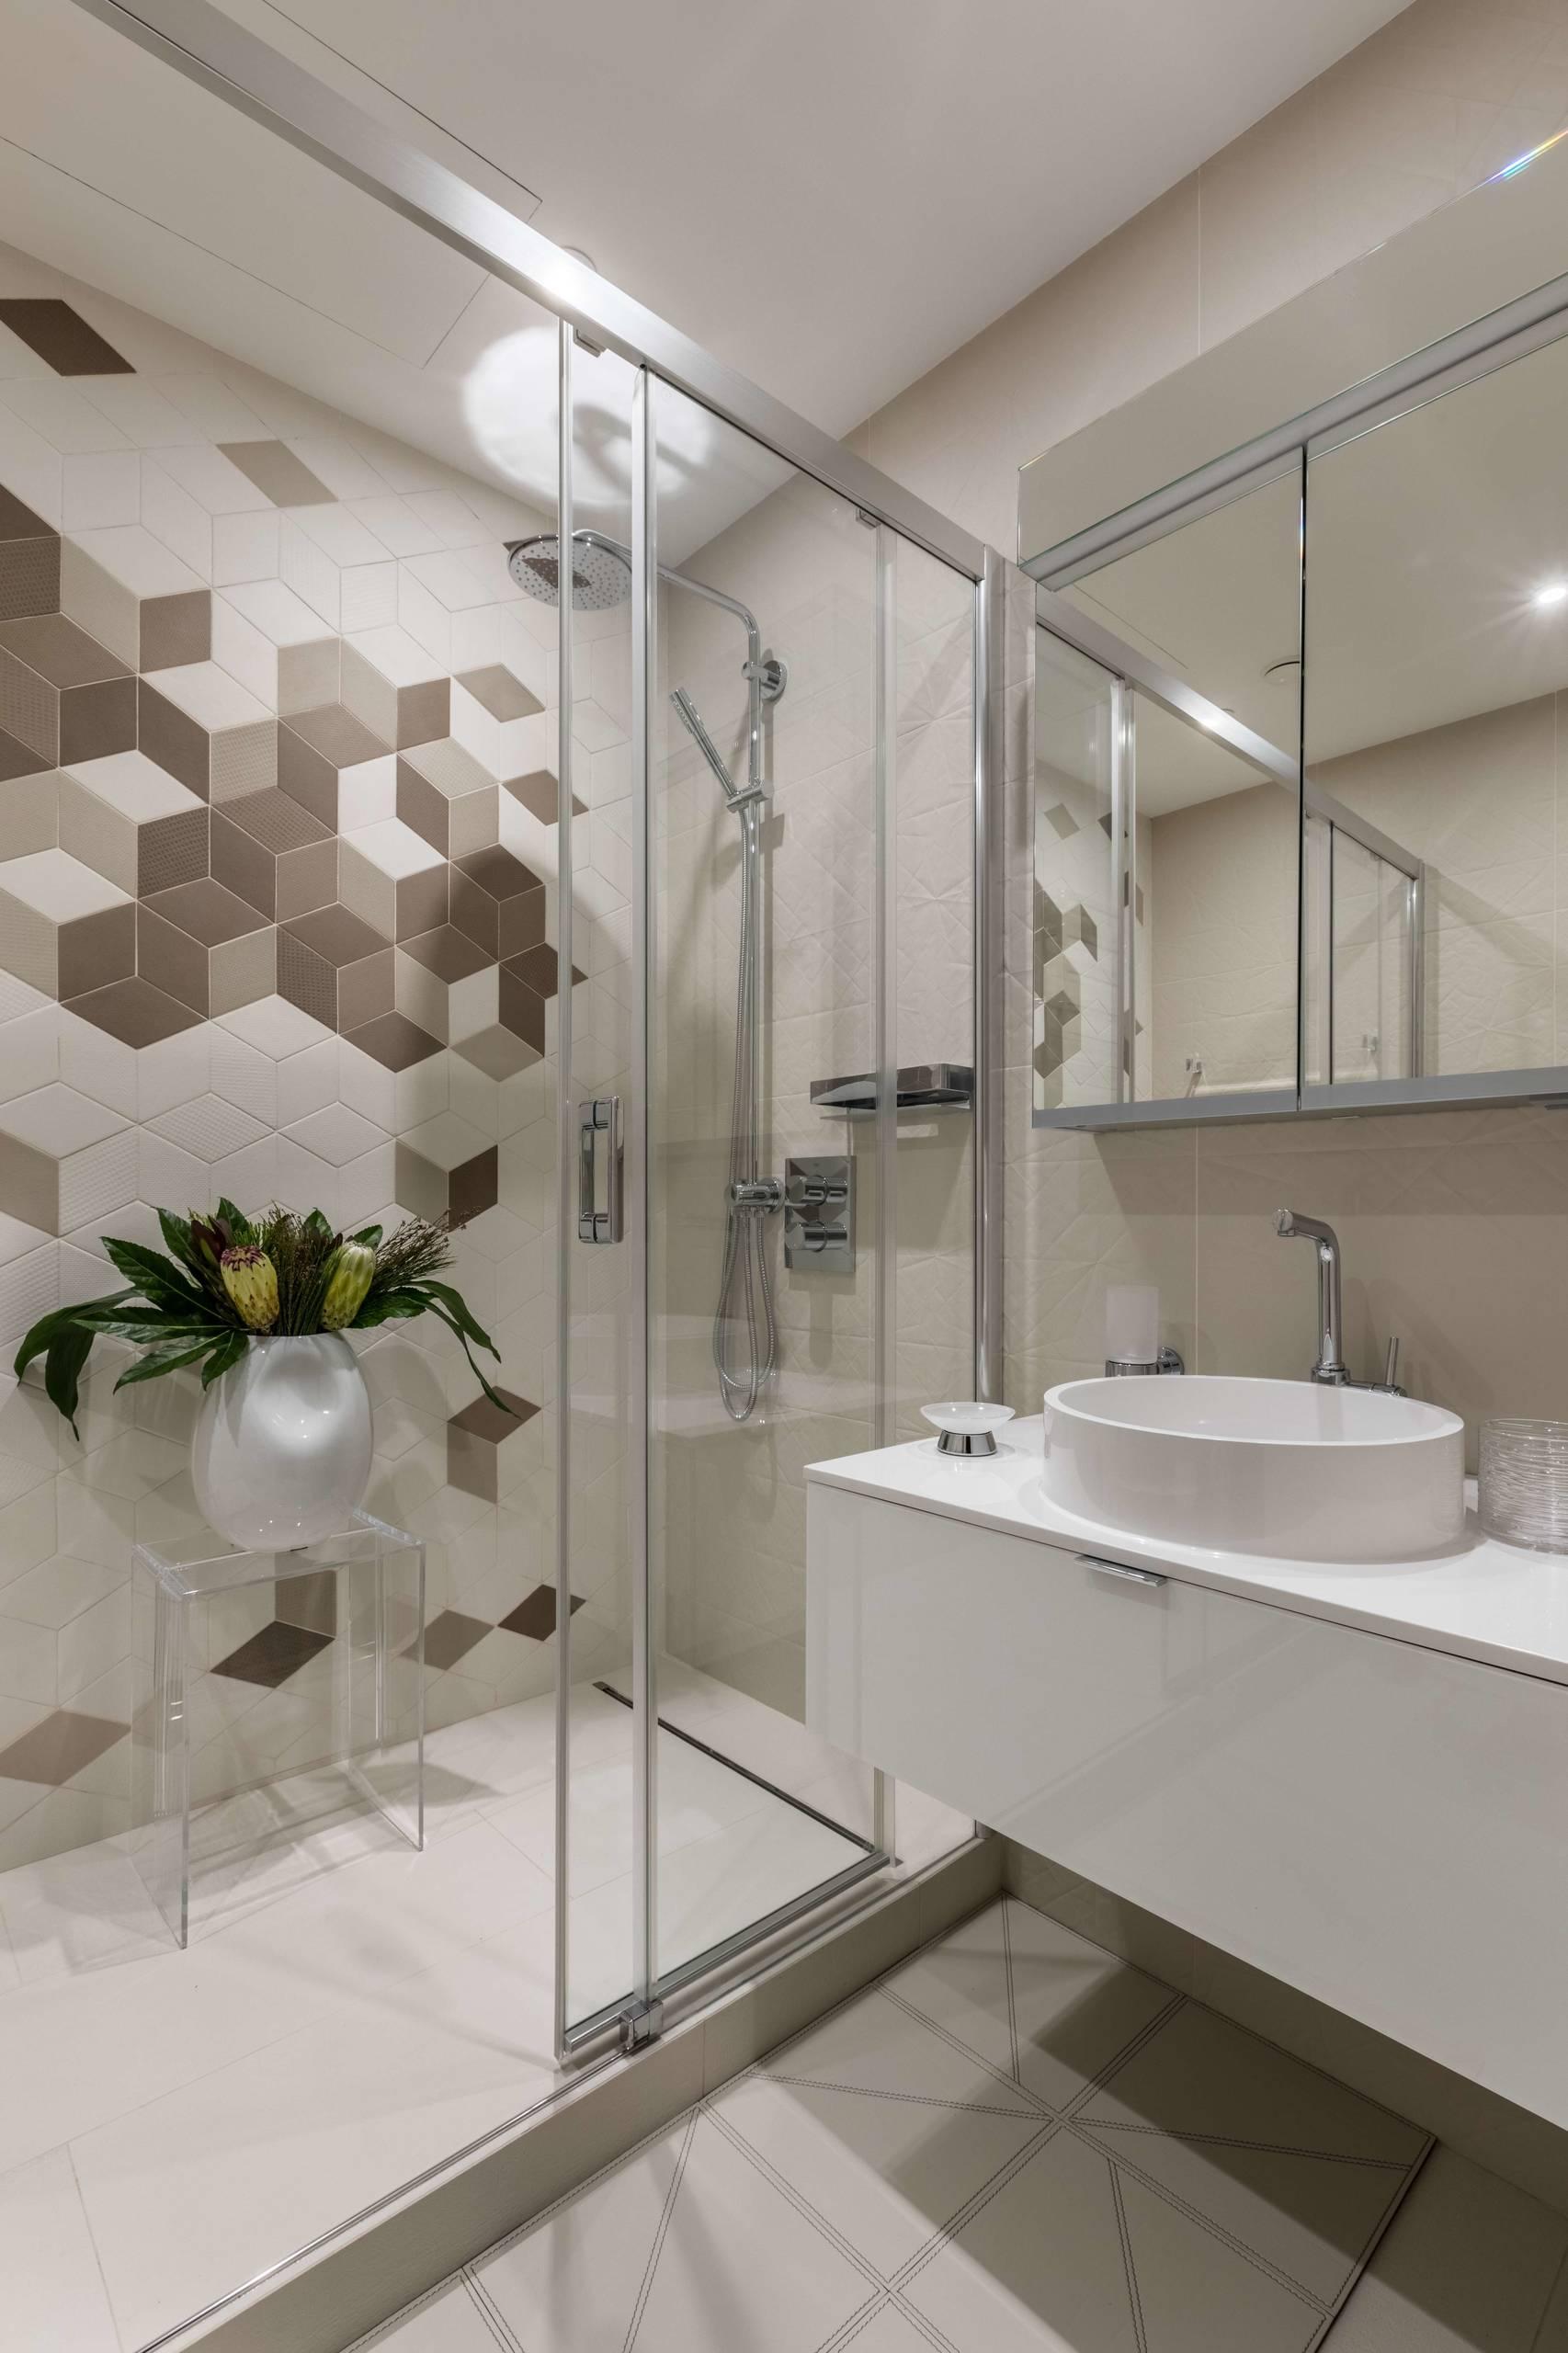 Nevada Salle De Bain shower room with brown tiles